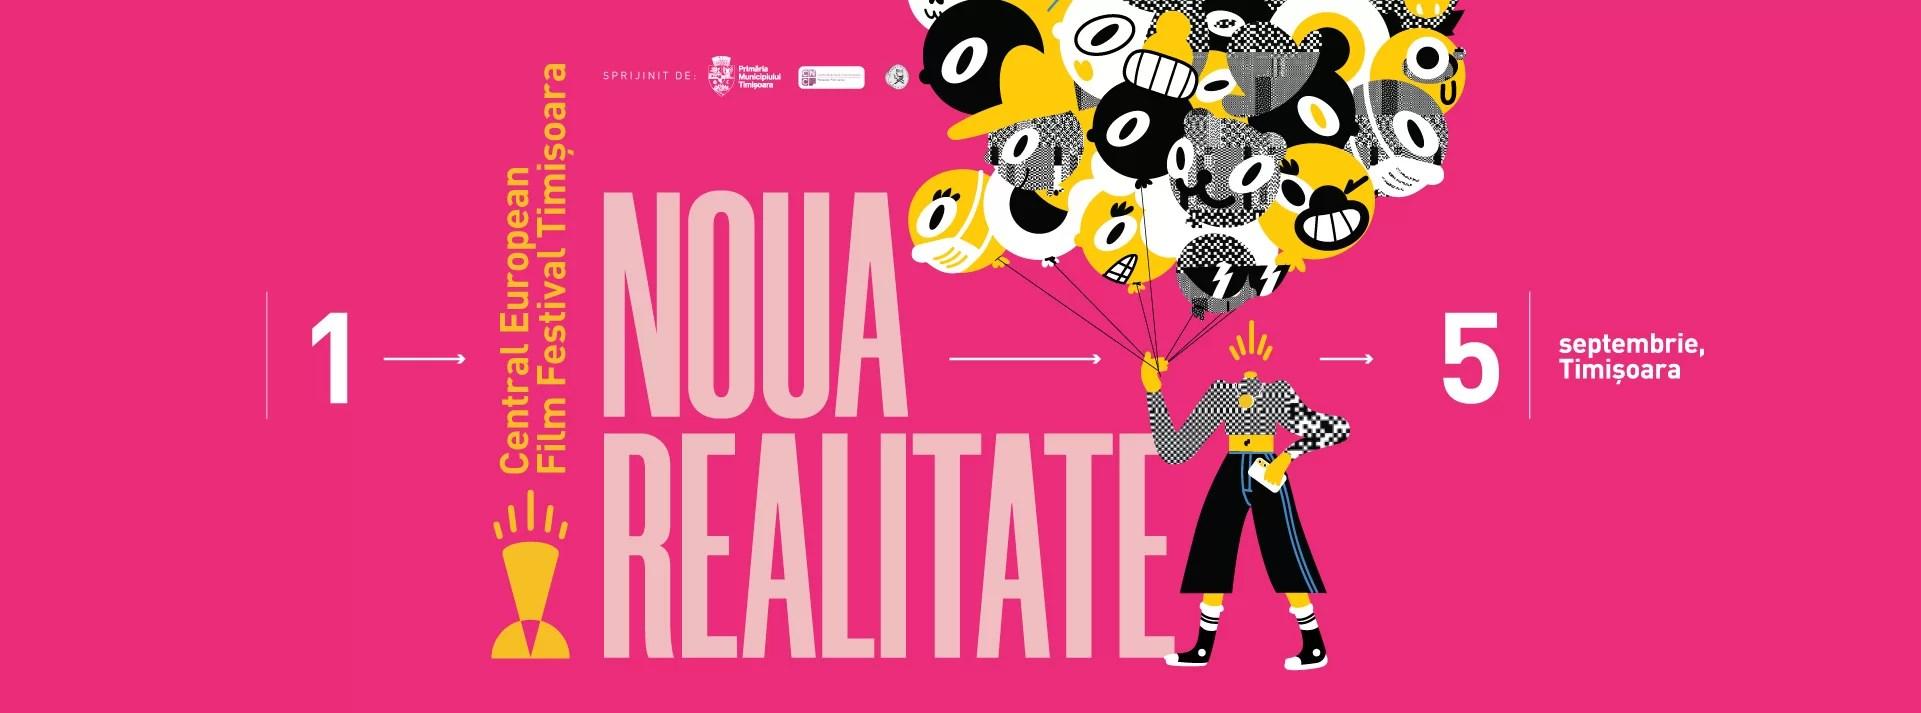 Program Central European Film Festival Timisoara 2021 - 1-5 septembrie 2021